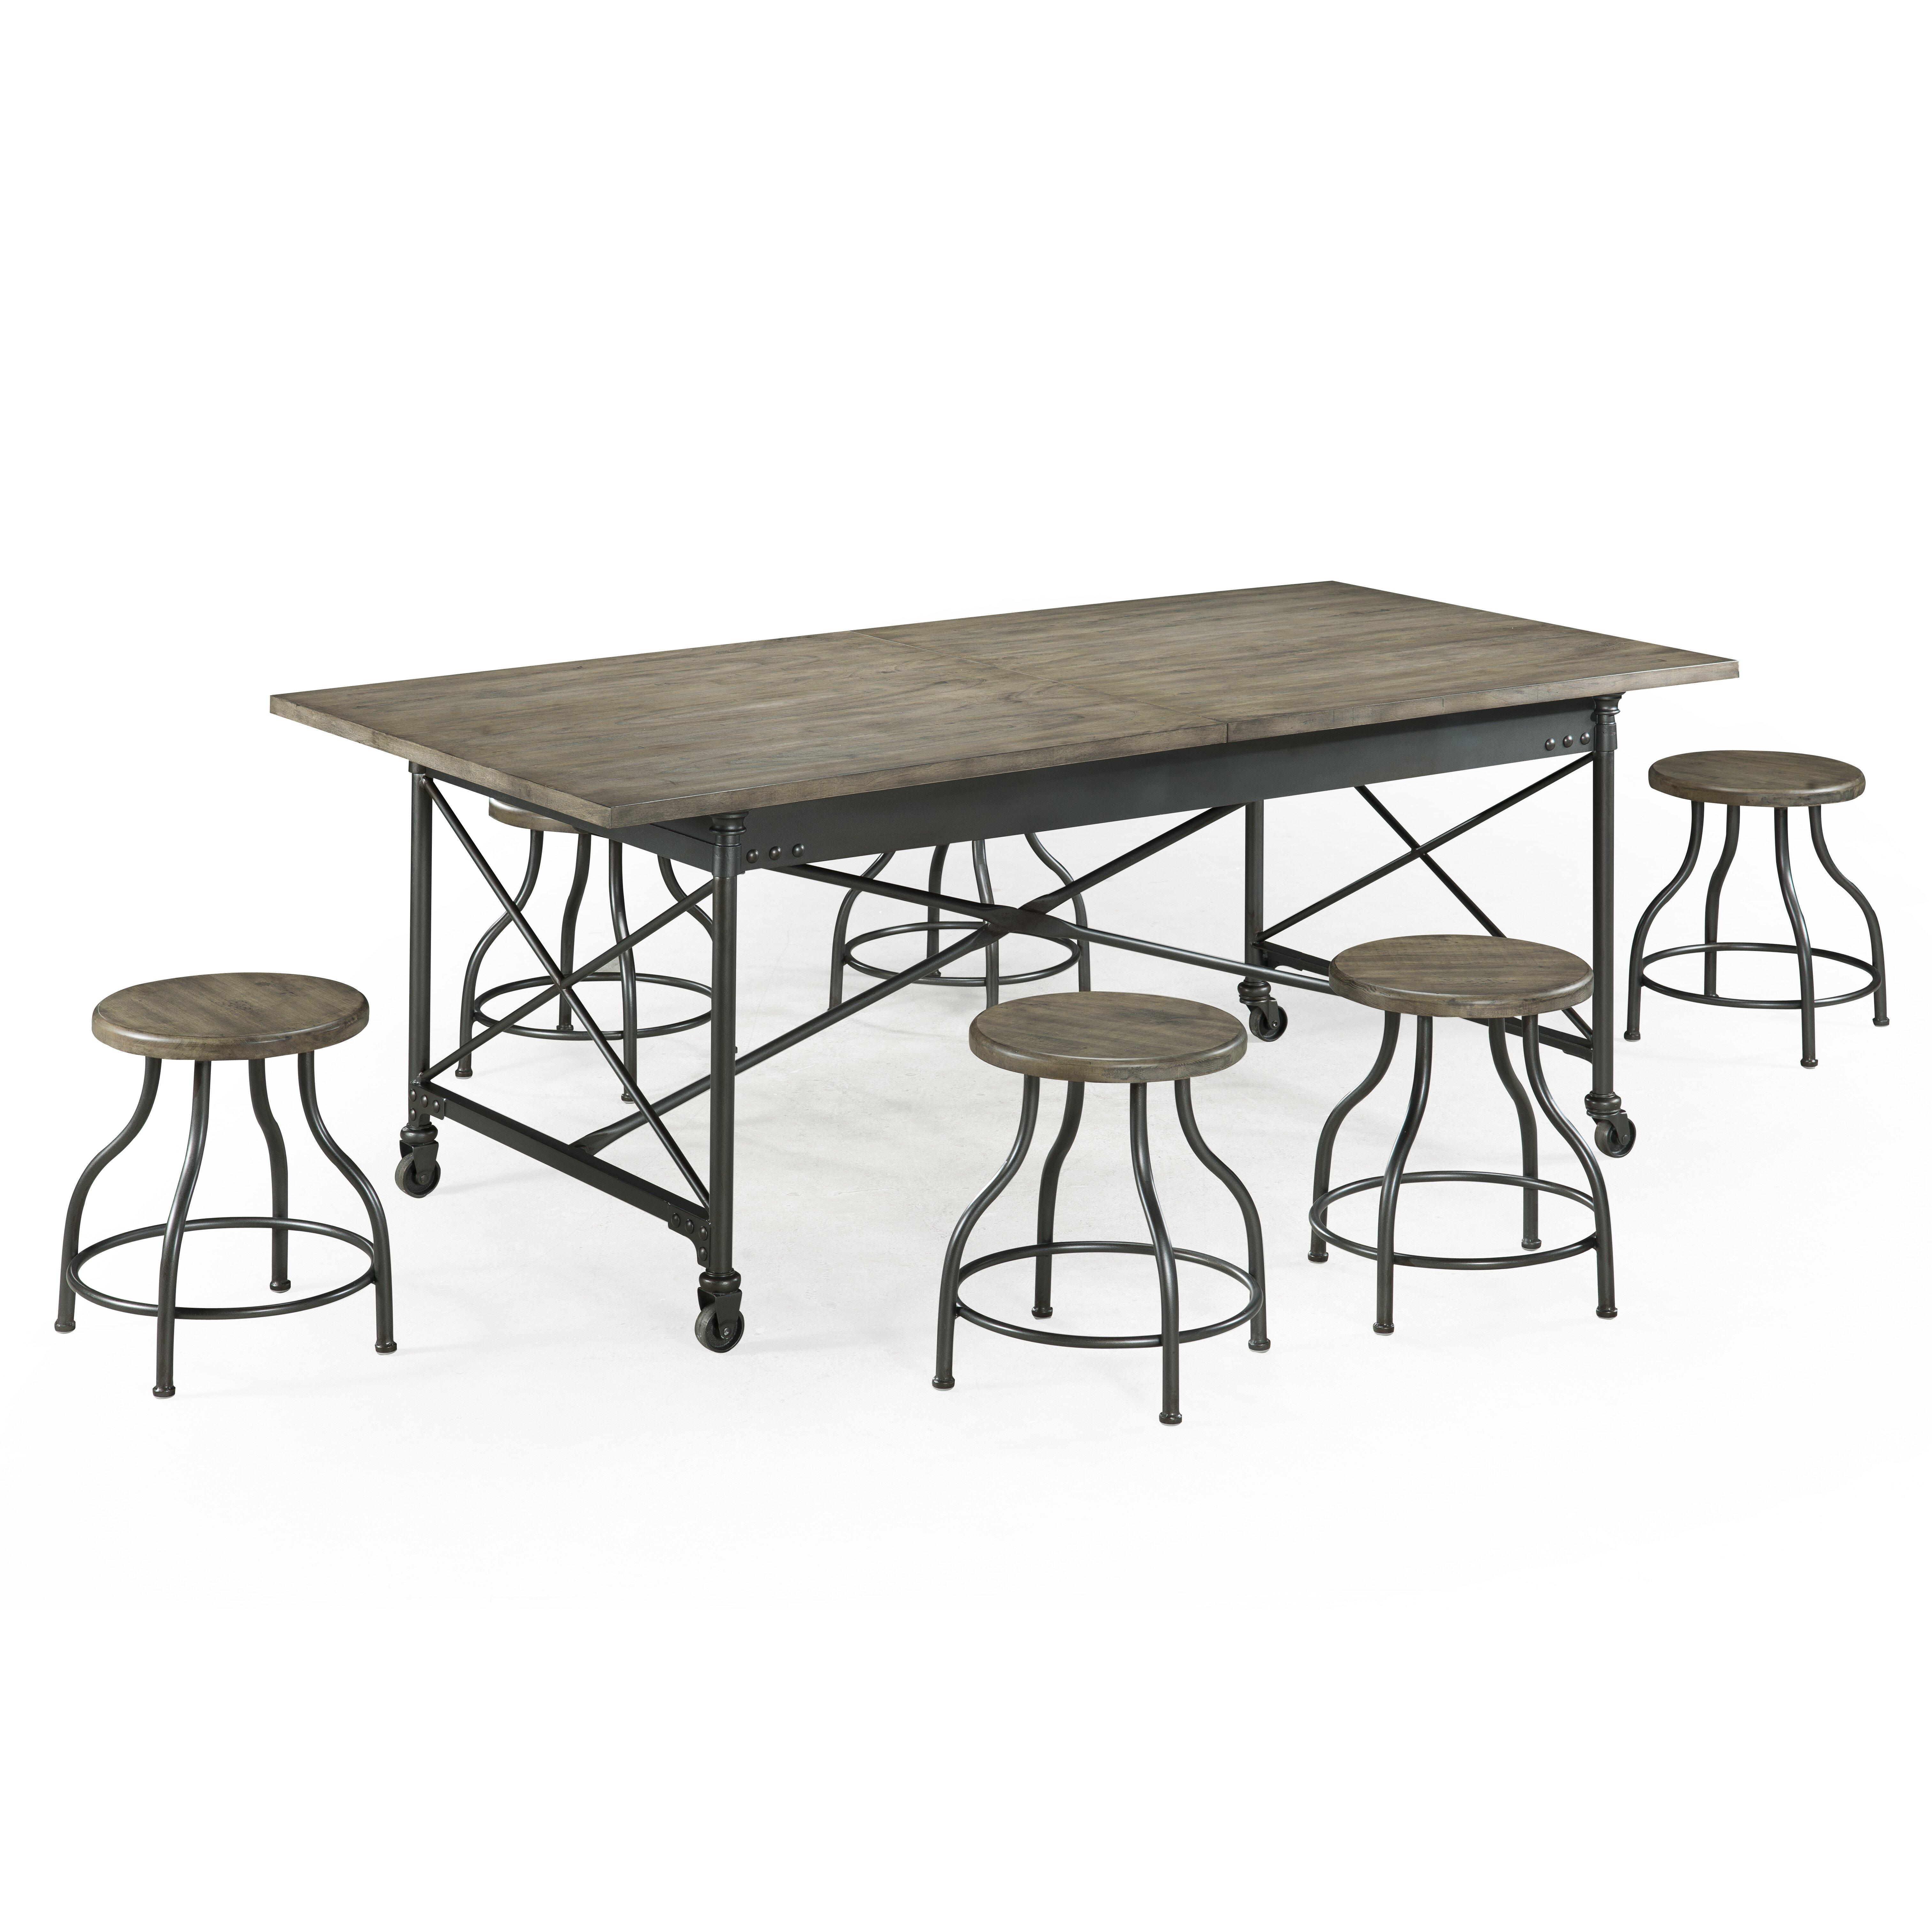 magnussen walton dining table reviews wayfair - Magnussen Dining Room Furniture